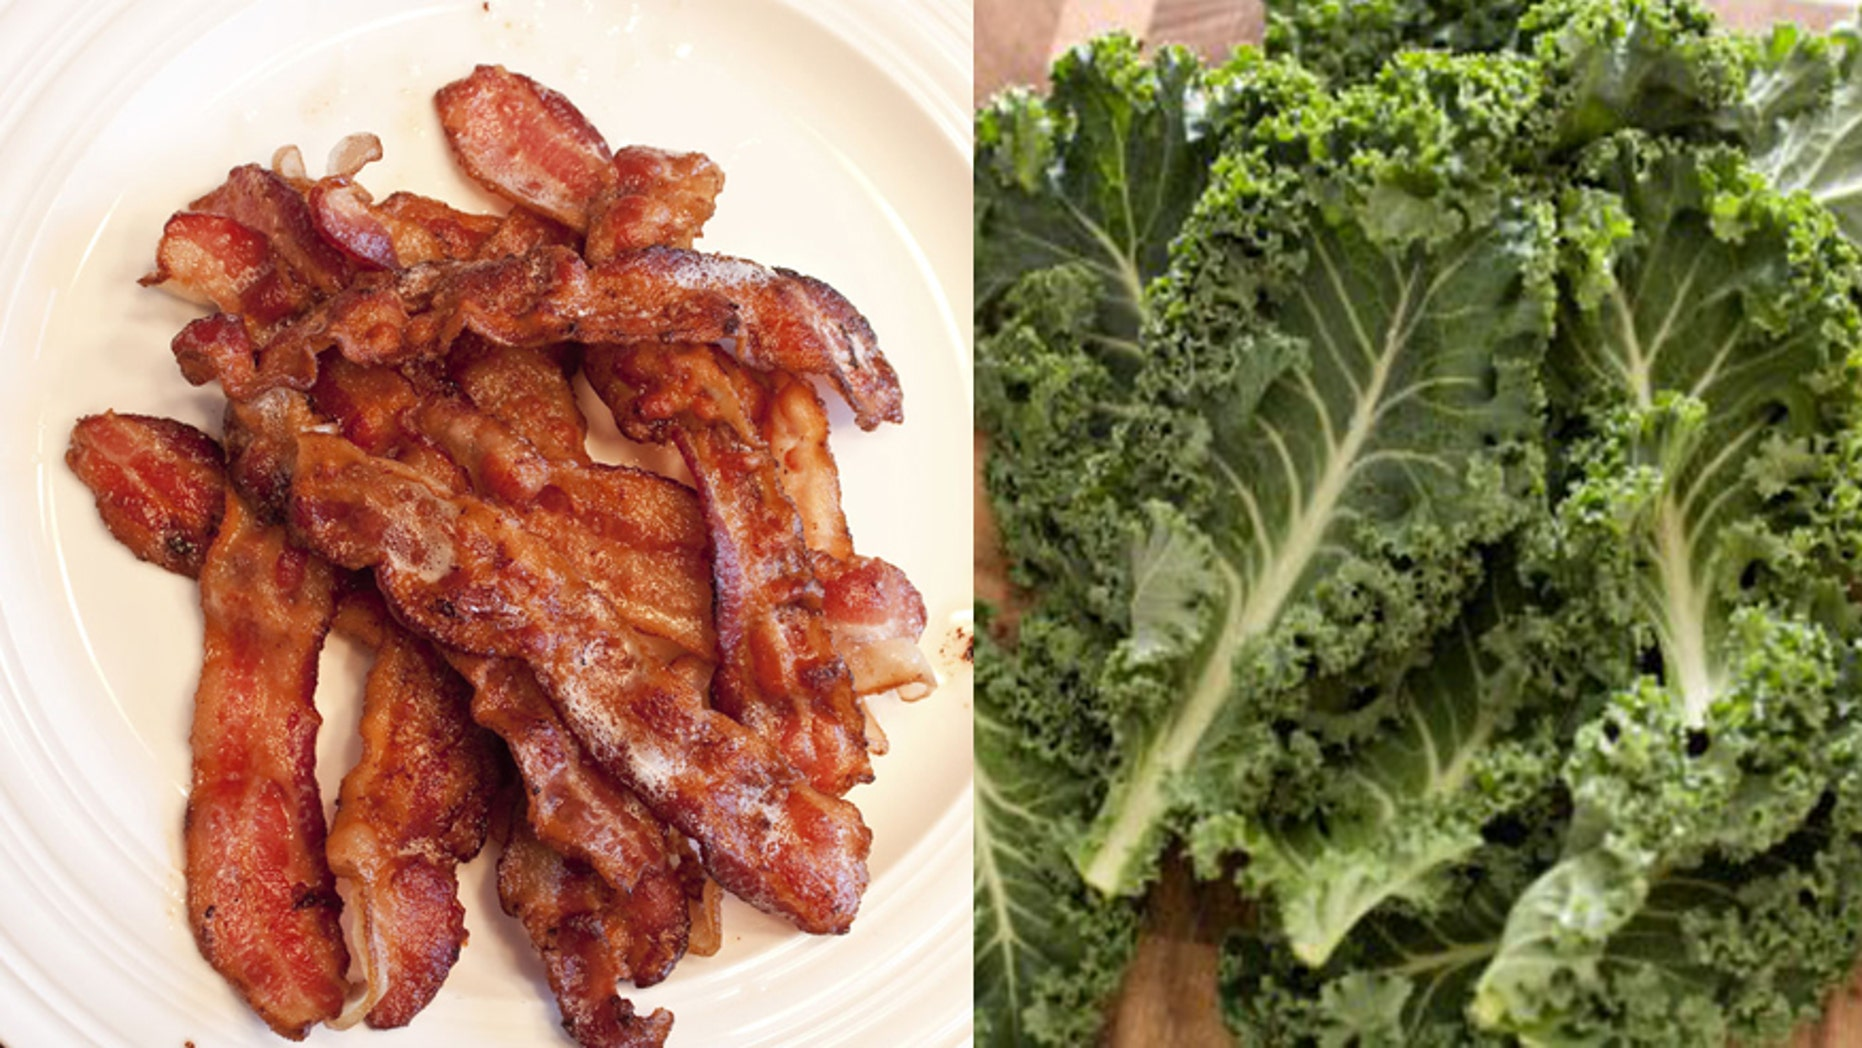 Kale-loving Demoncrat? Or bacon-loving Republican?